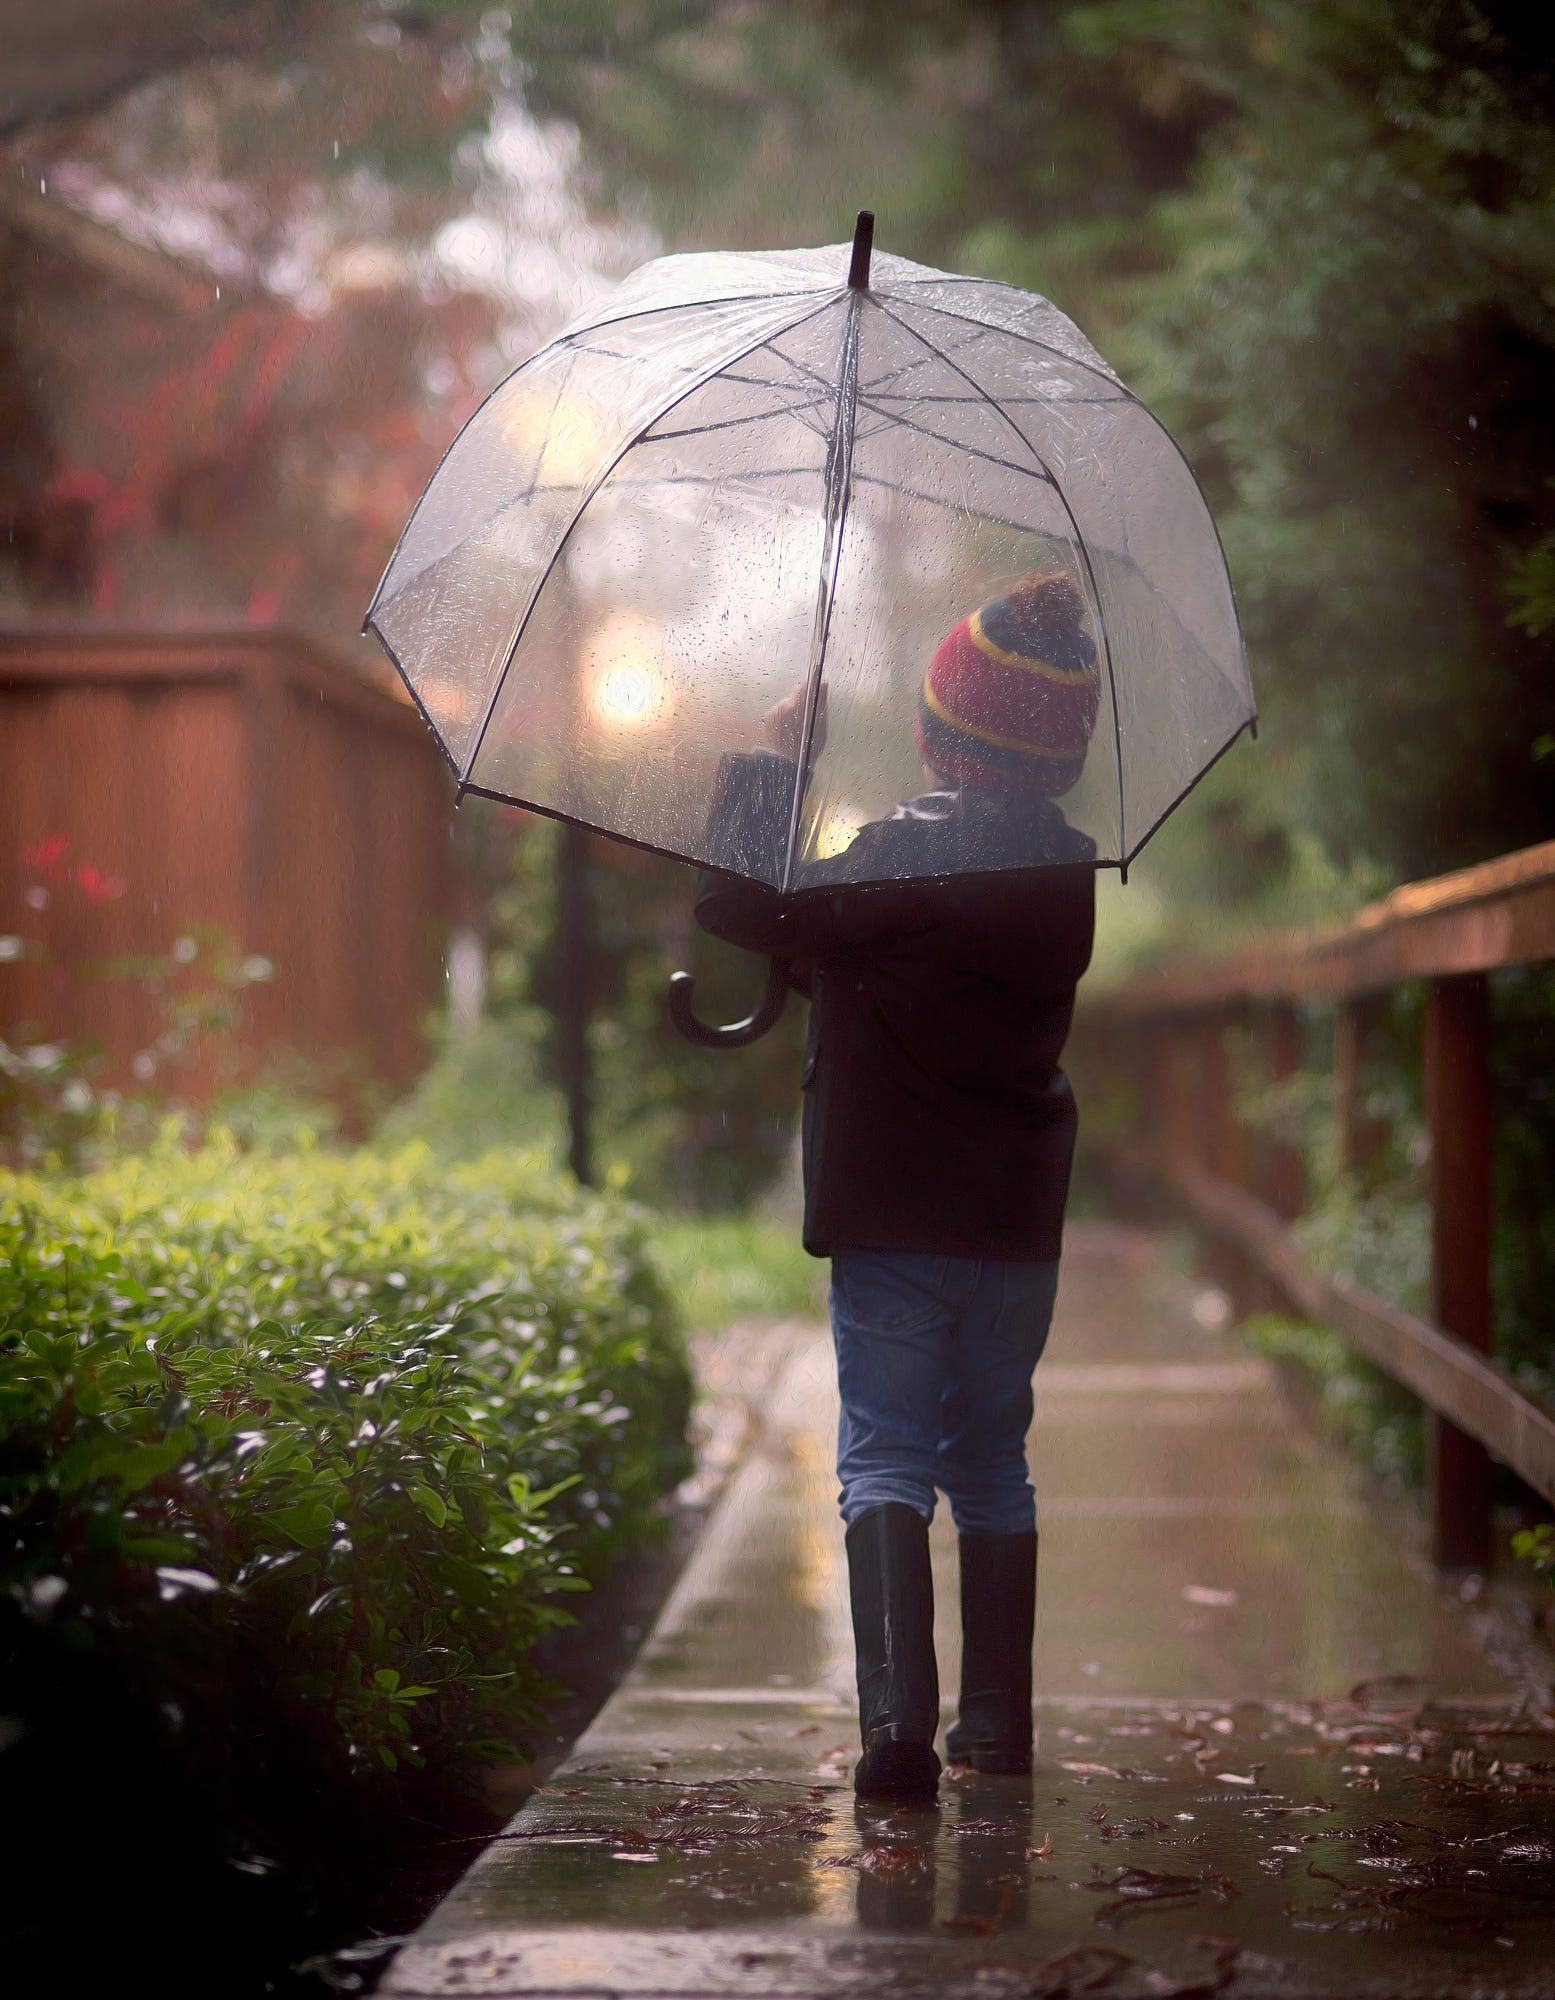 Rainy by Sonja Stone